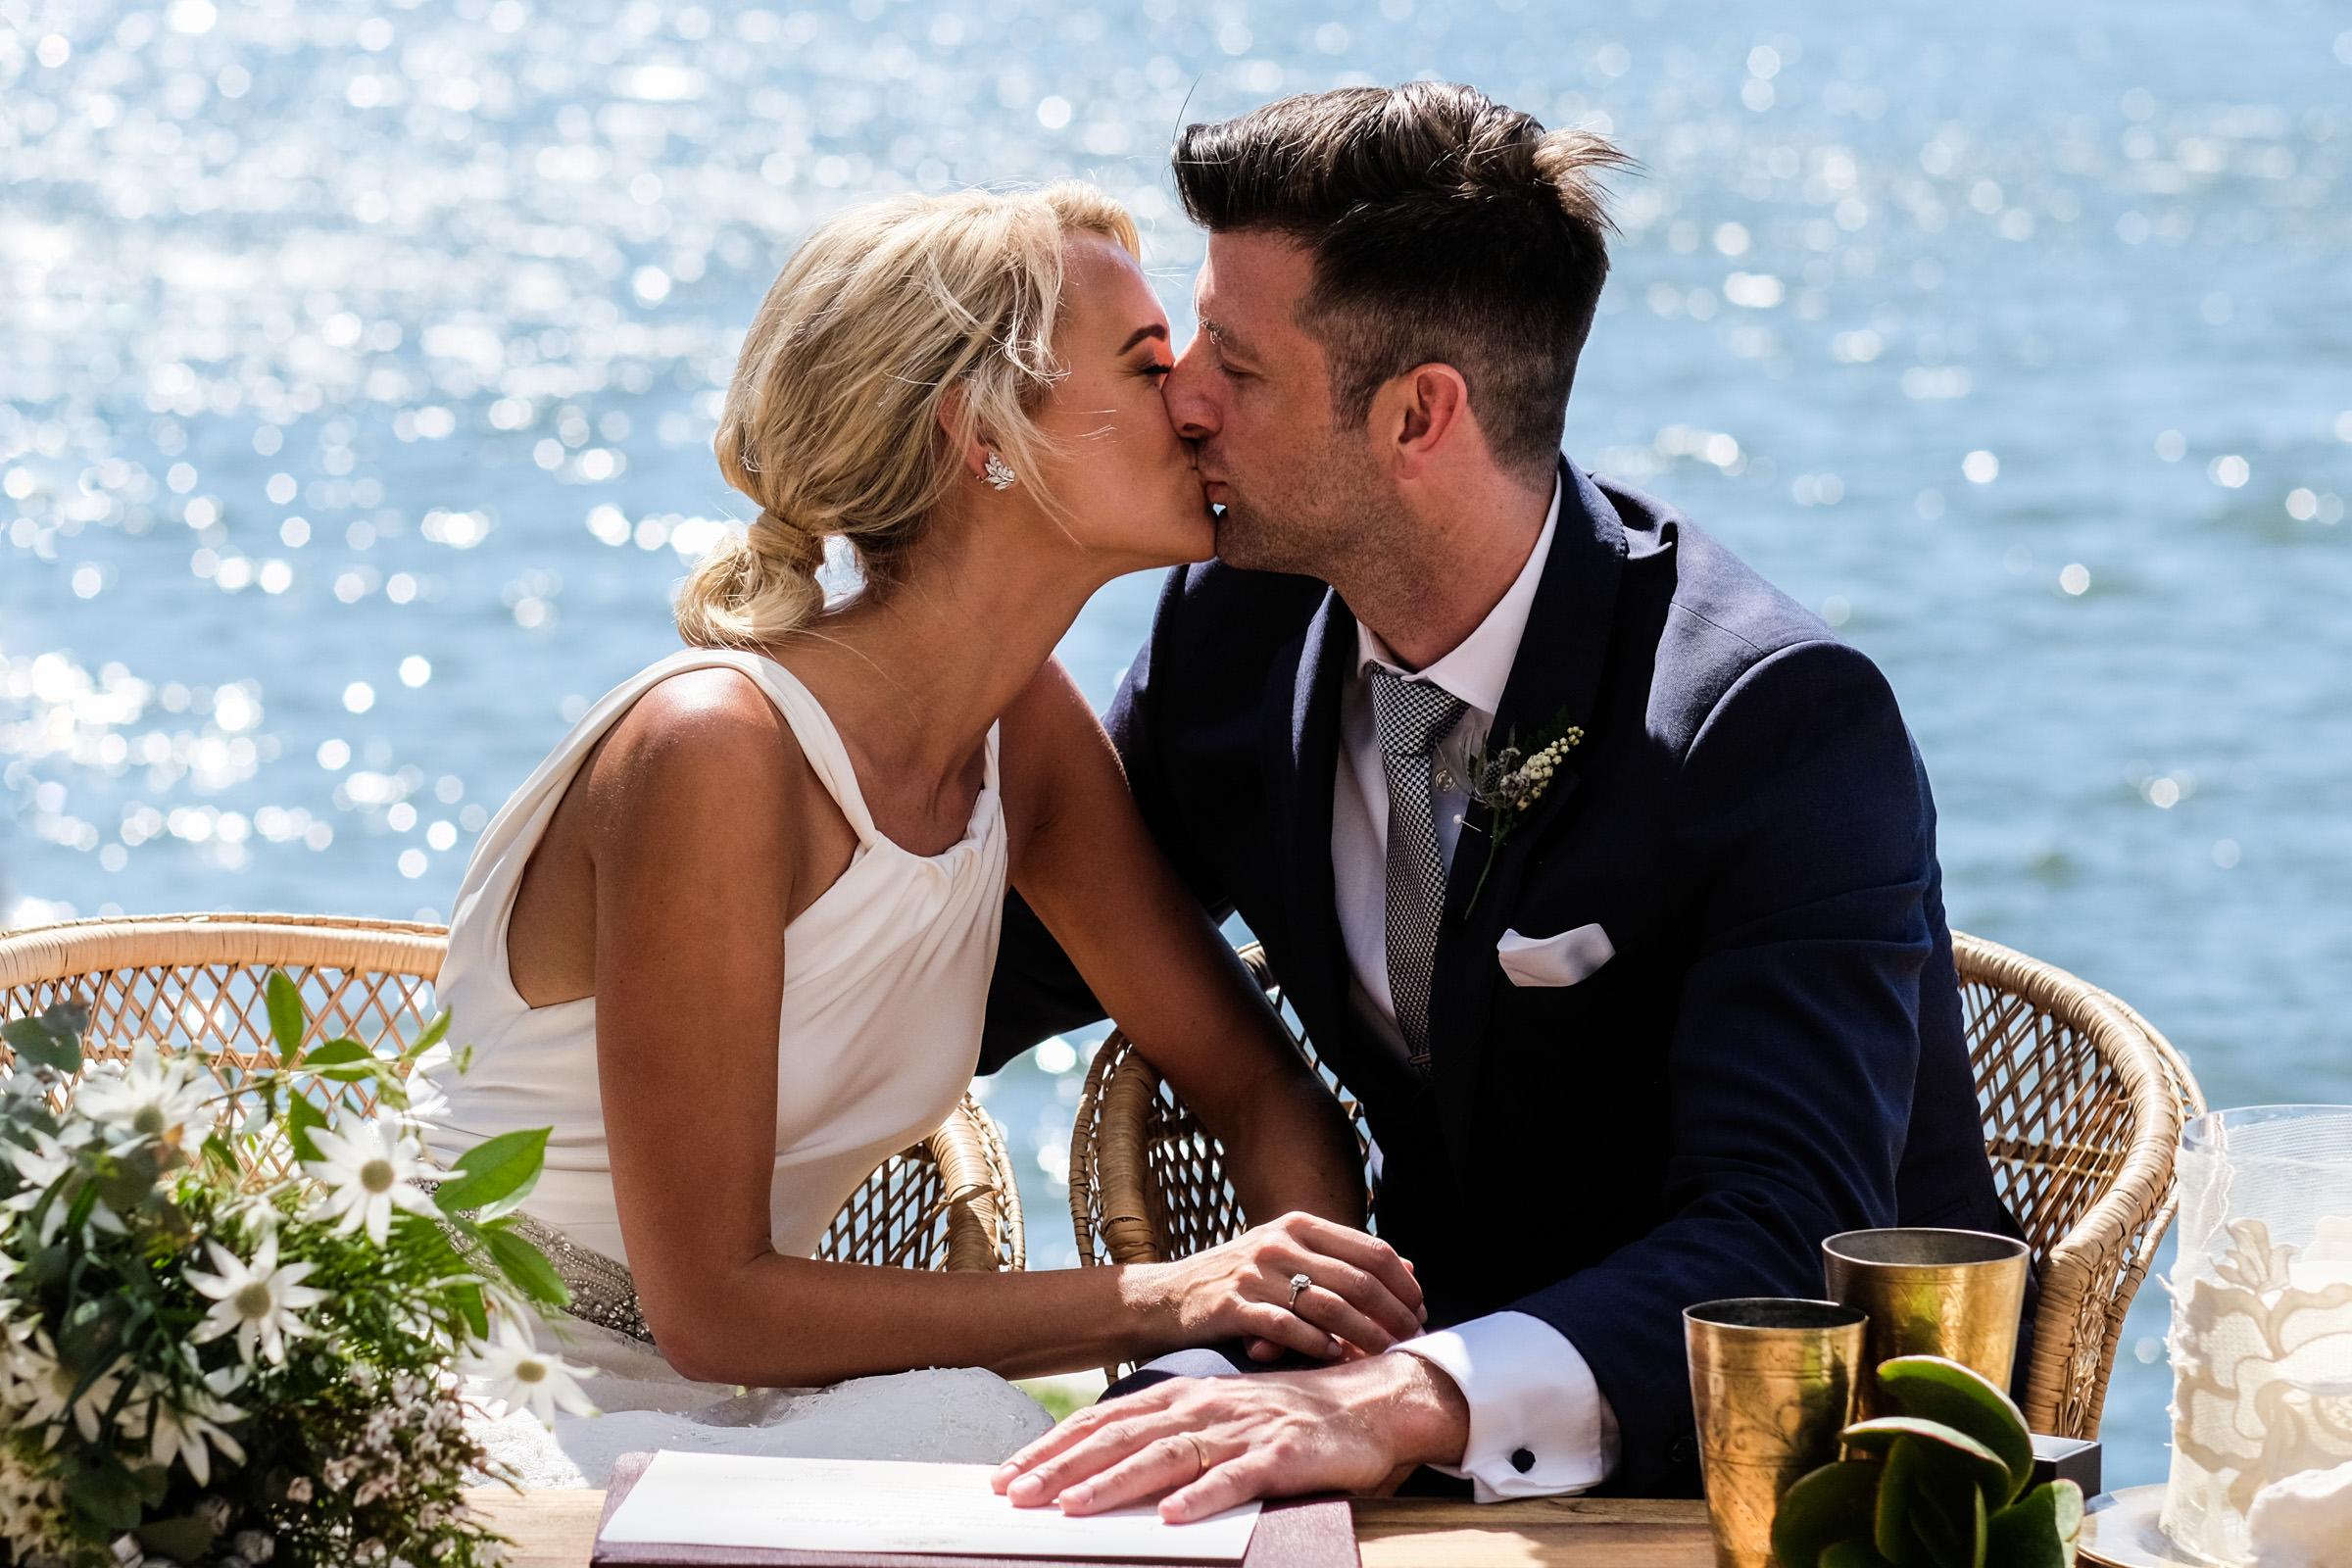 Peats+Bite+Wedding+Photography+015.jpg